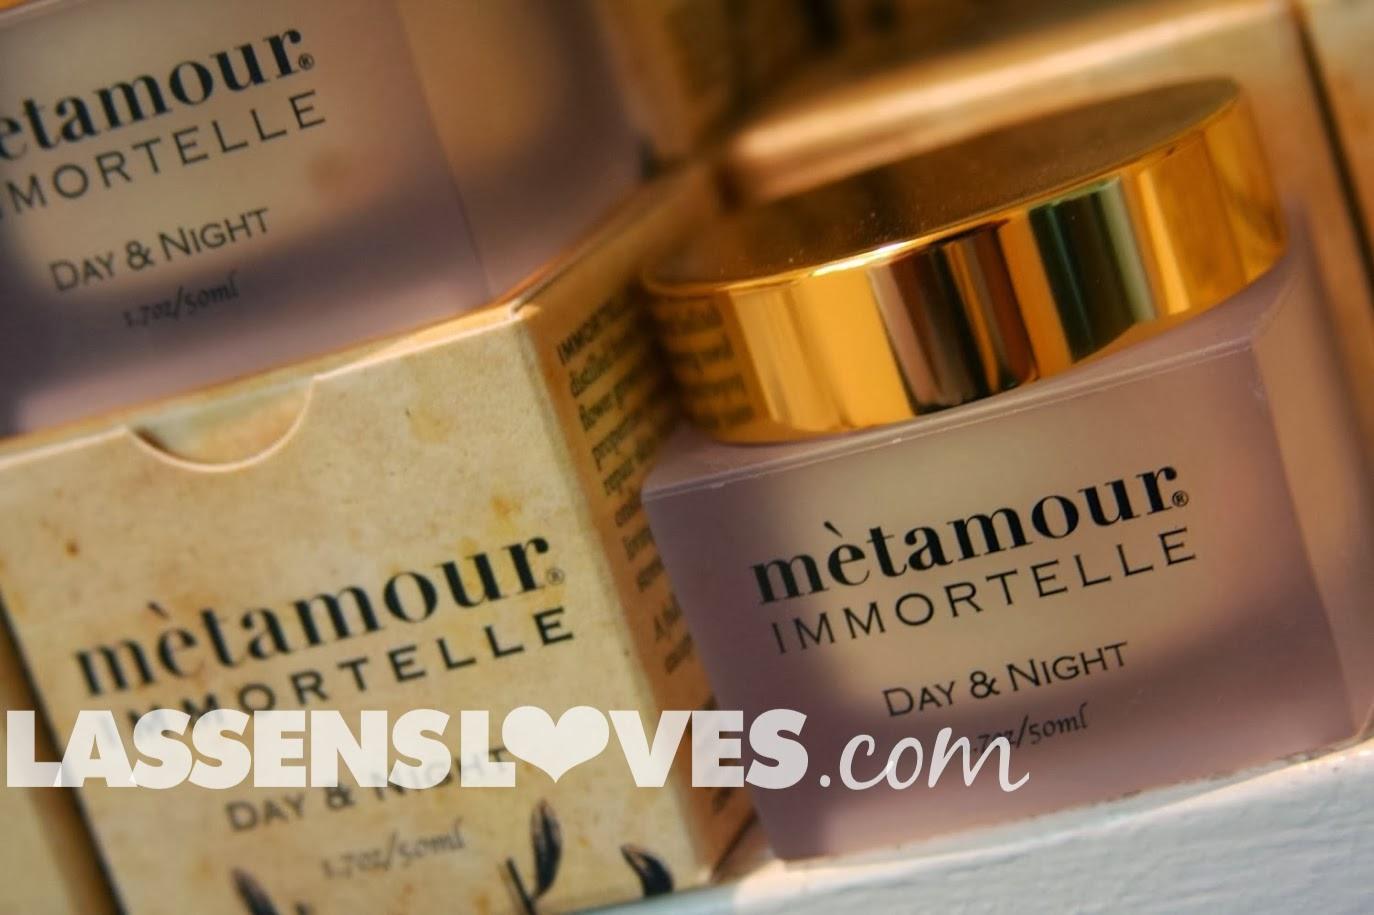 lassensloves.com, Lassen's, metamour+immortelle, natural+skin+care, Day+night+cream